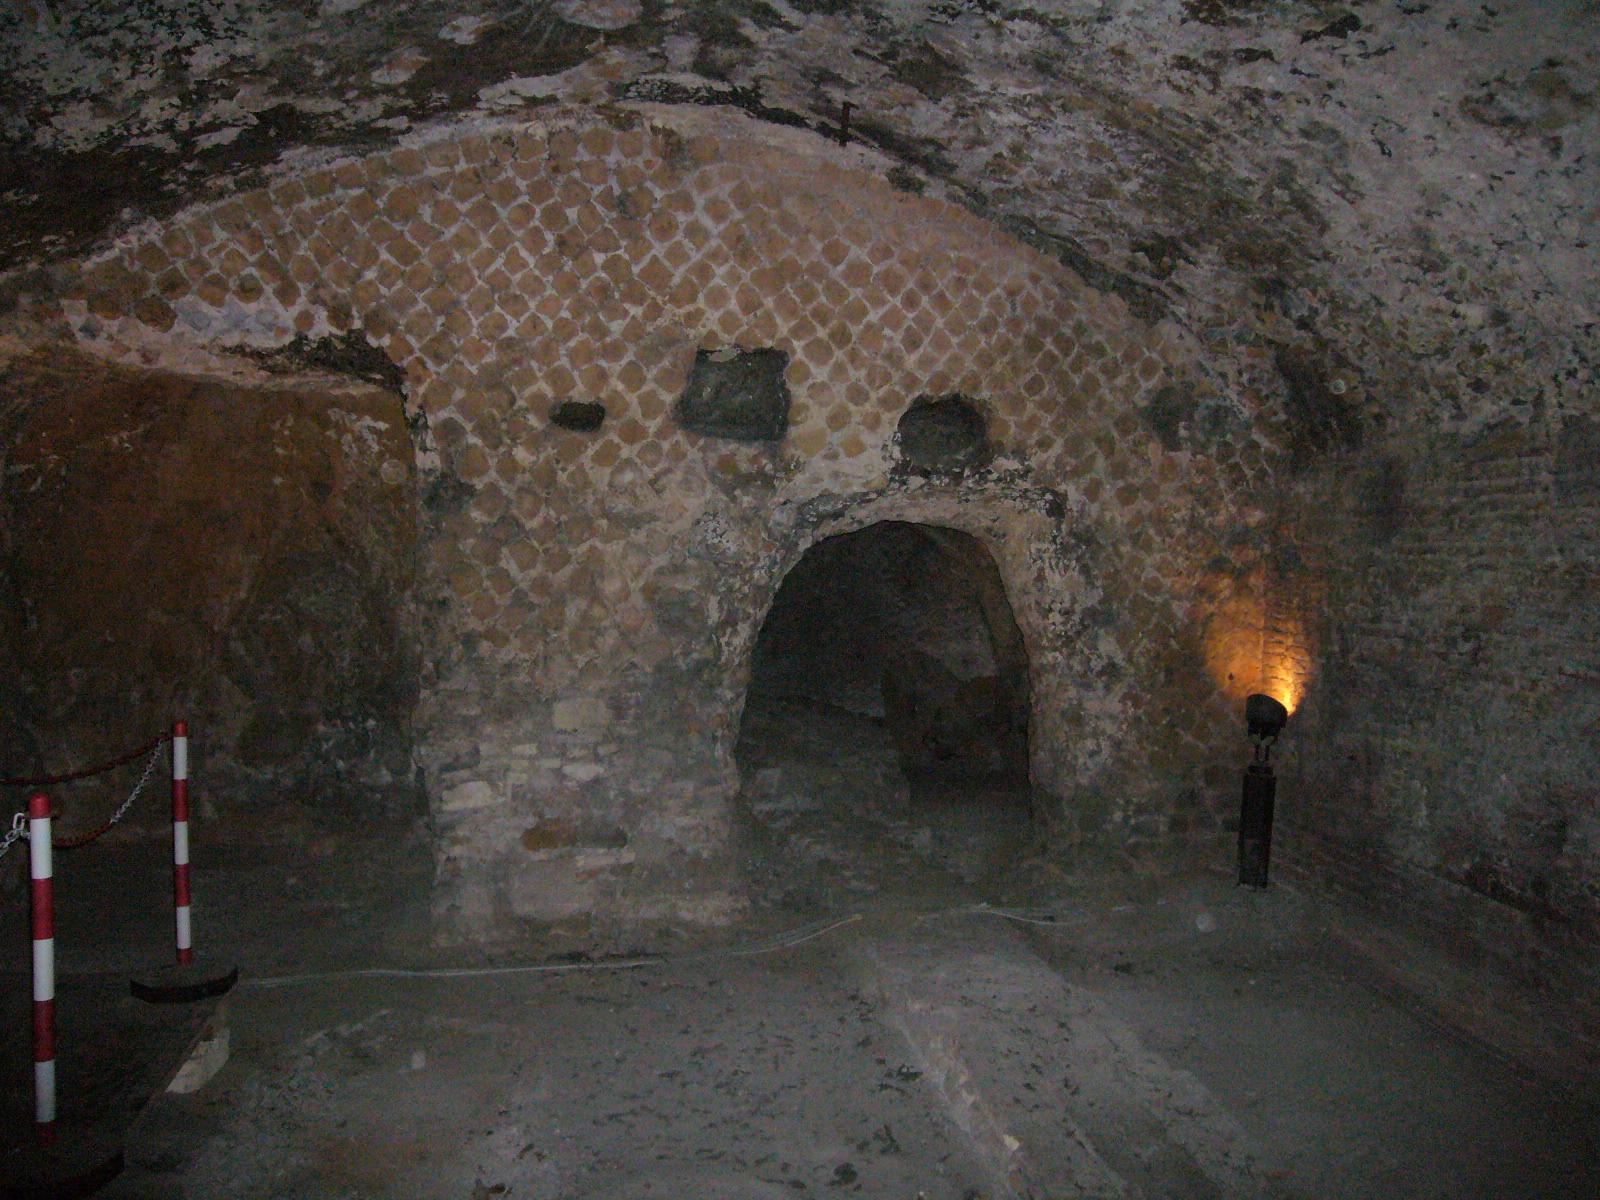 Файл:Campitelli - insula aracoeli interno 1060155.JPG